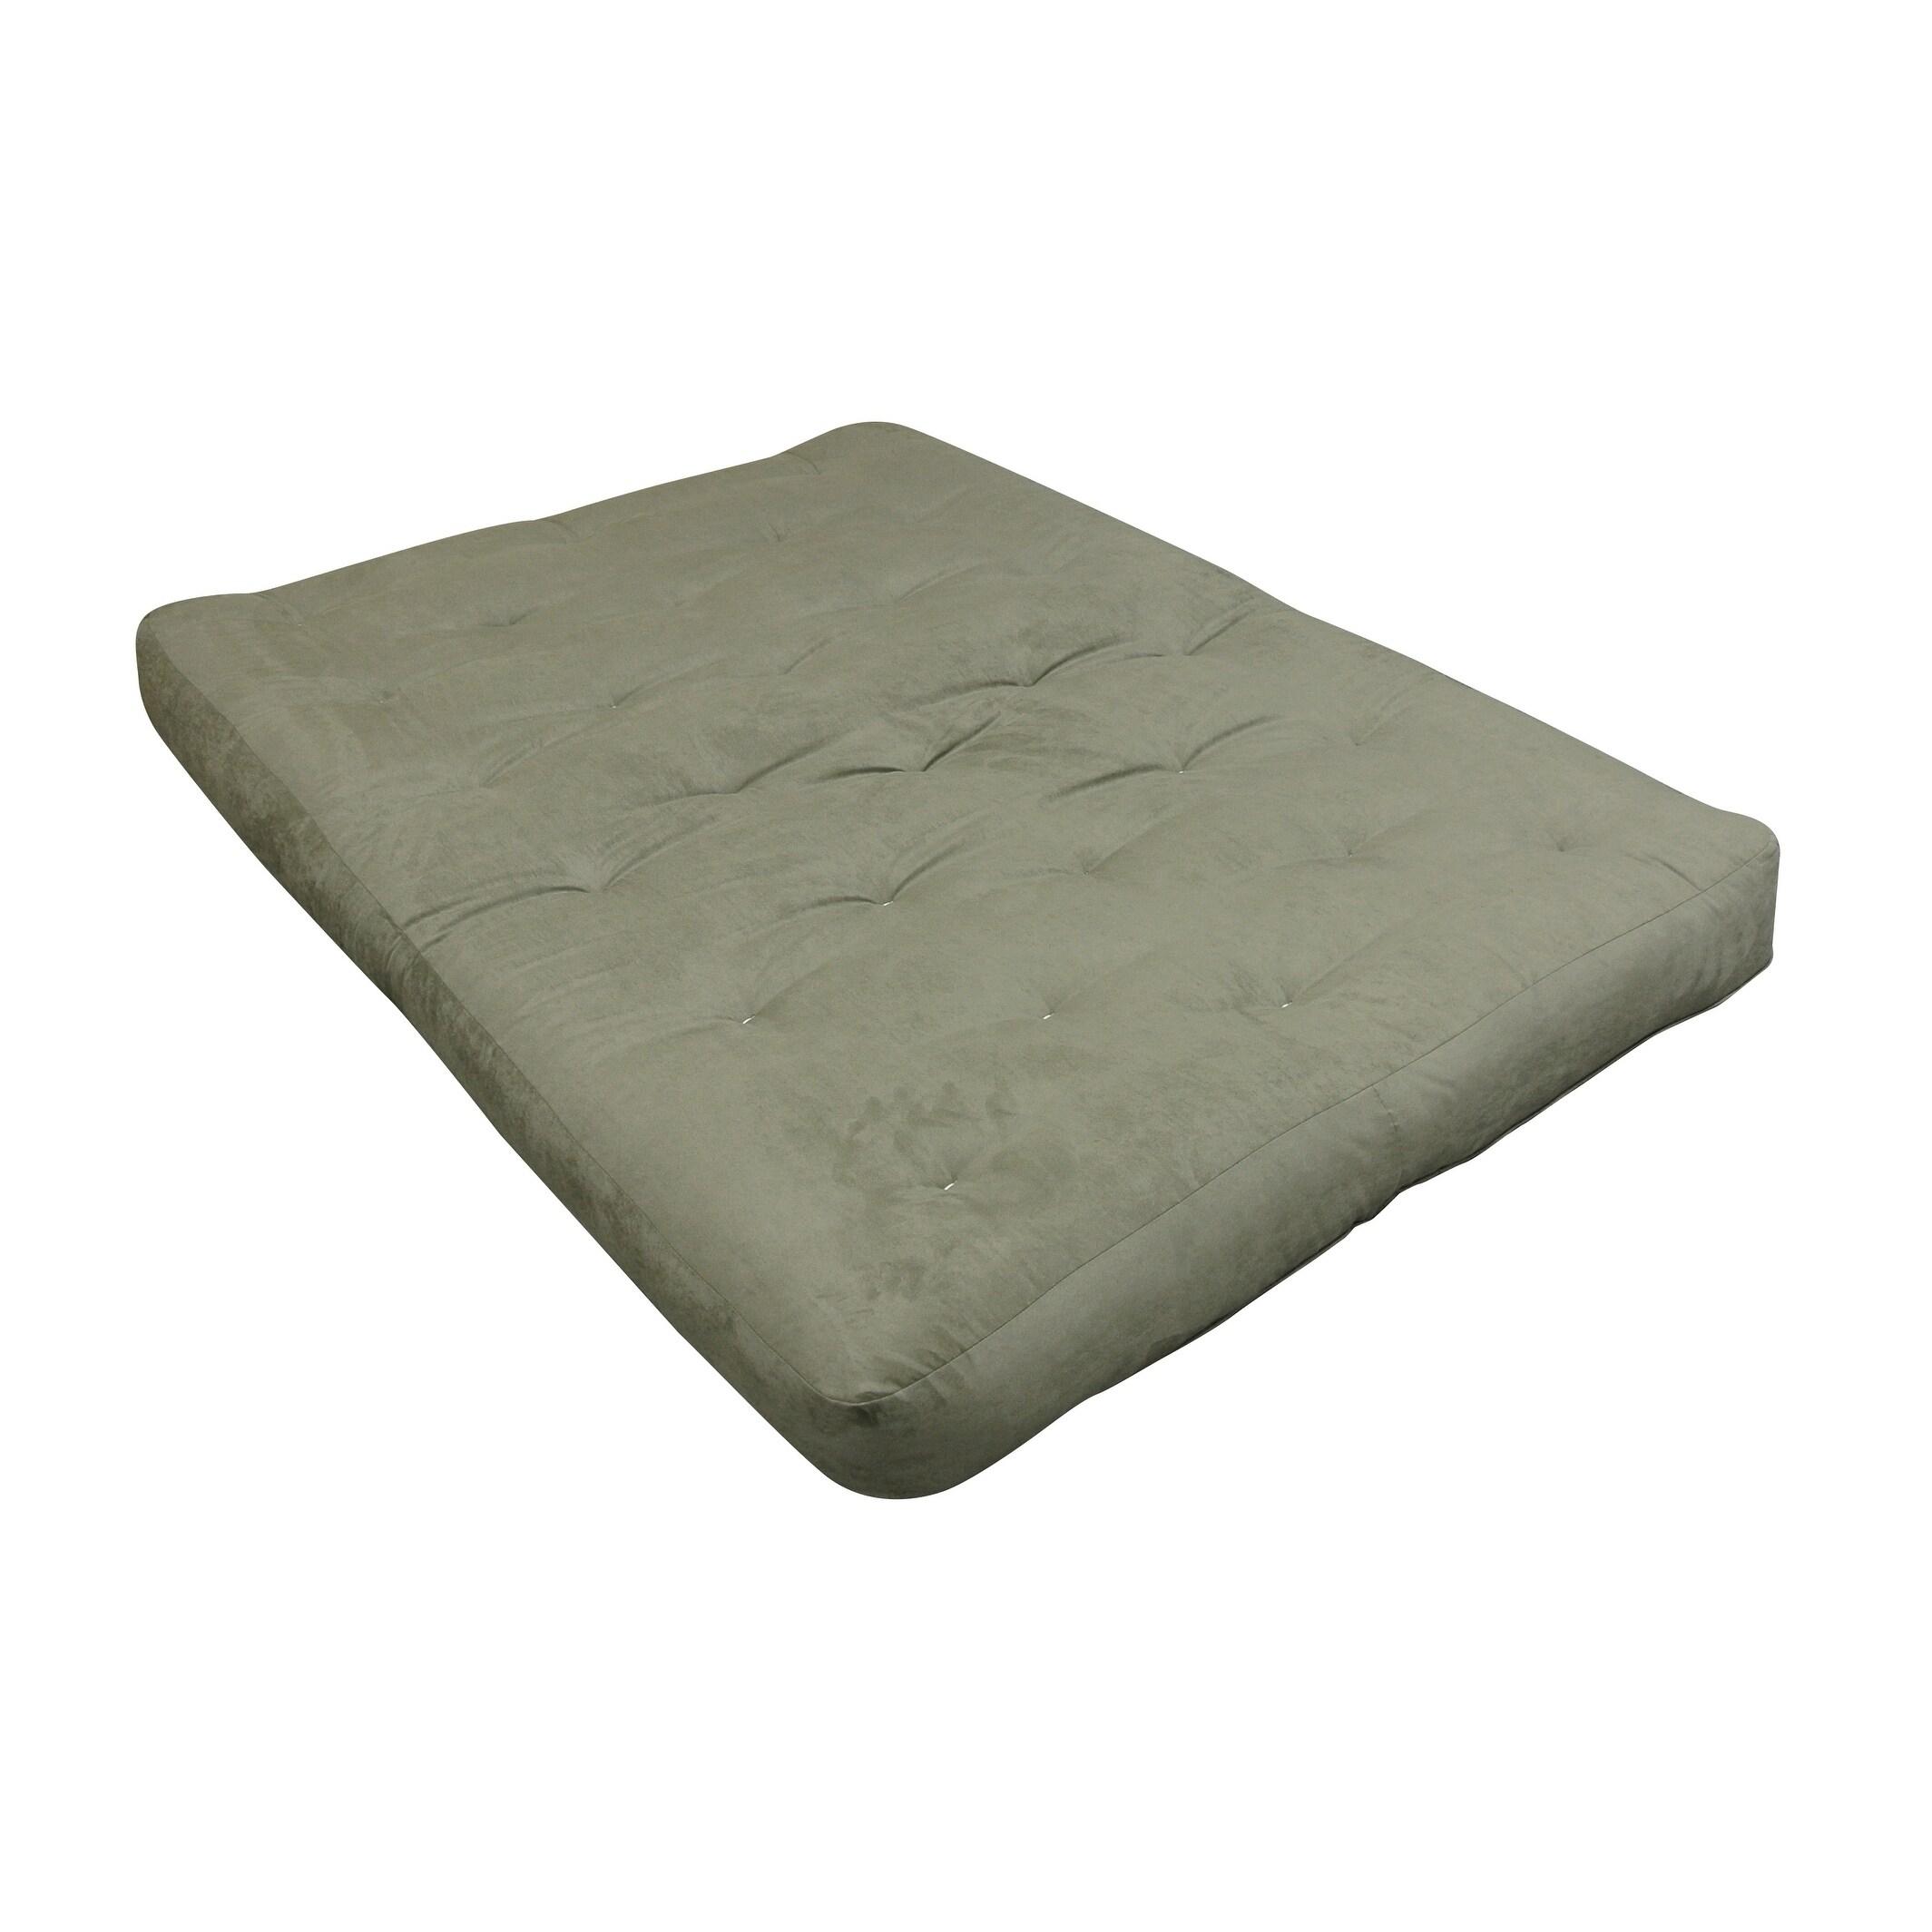 8 Double Foam Cotton Twin Xl 39x80 Sage Microfiber Futon Mattress Free Shipping Today 23944561